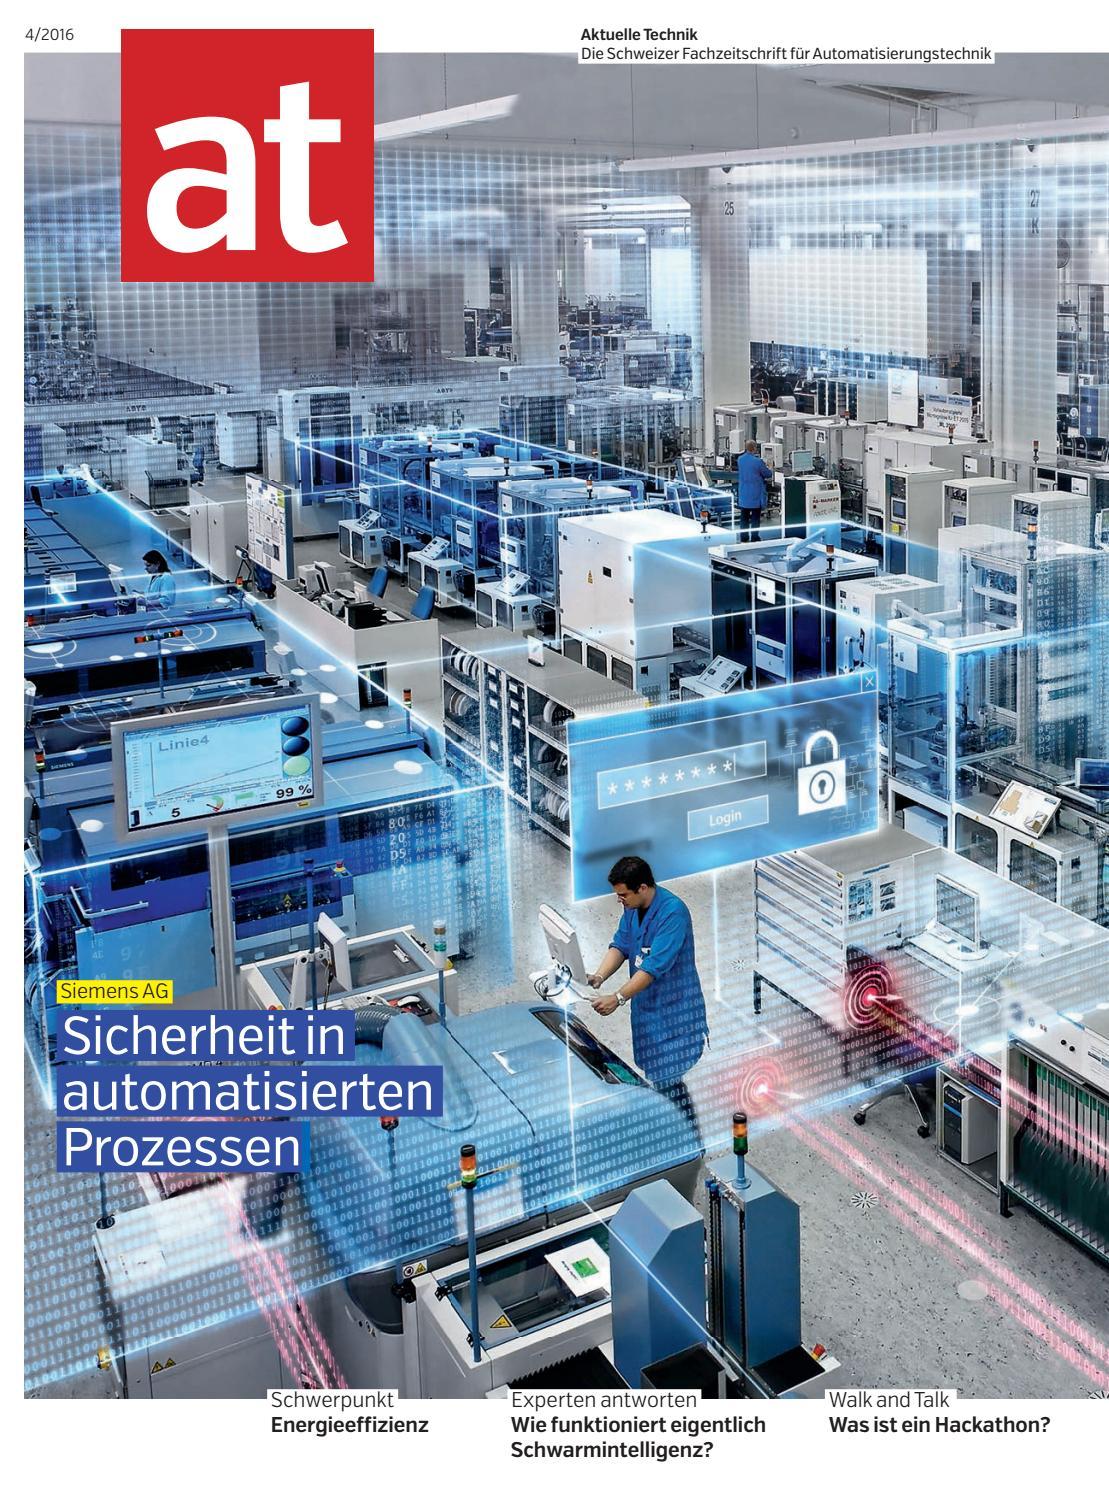 at - Aktuelle Technik 04 2016 by BL Verlag AG - issuu